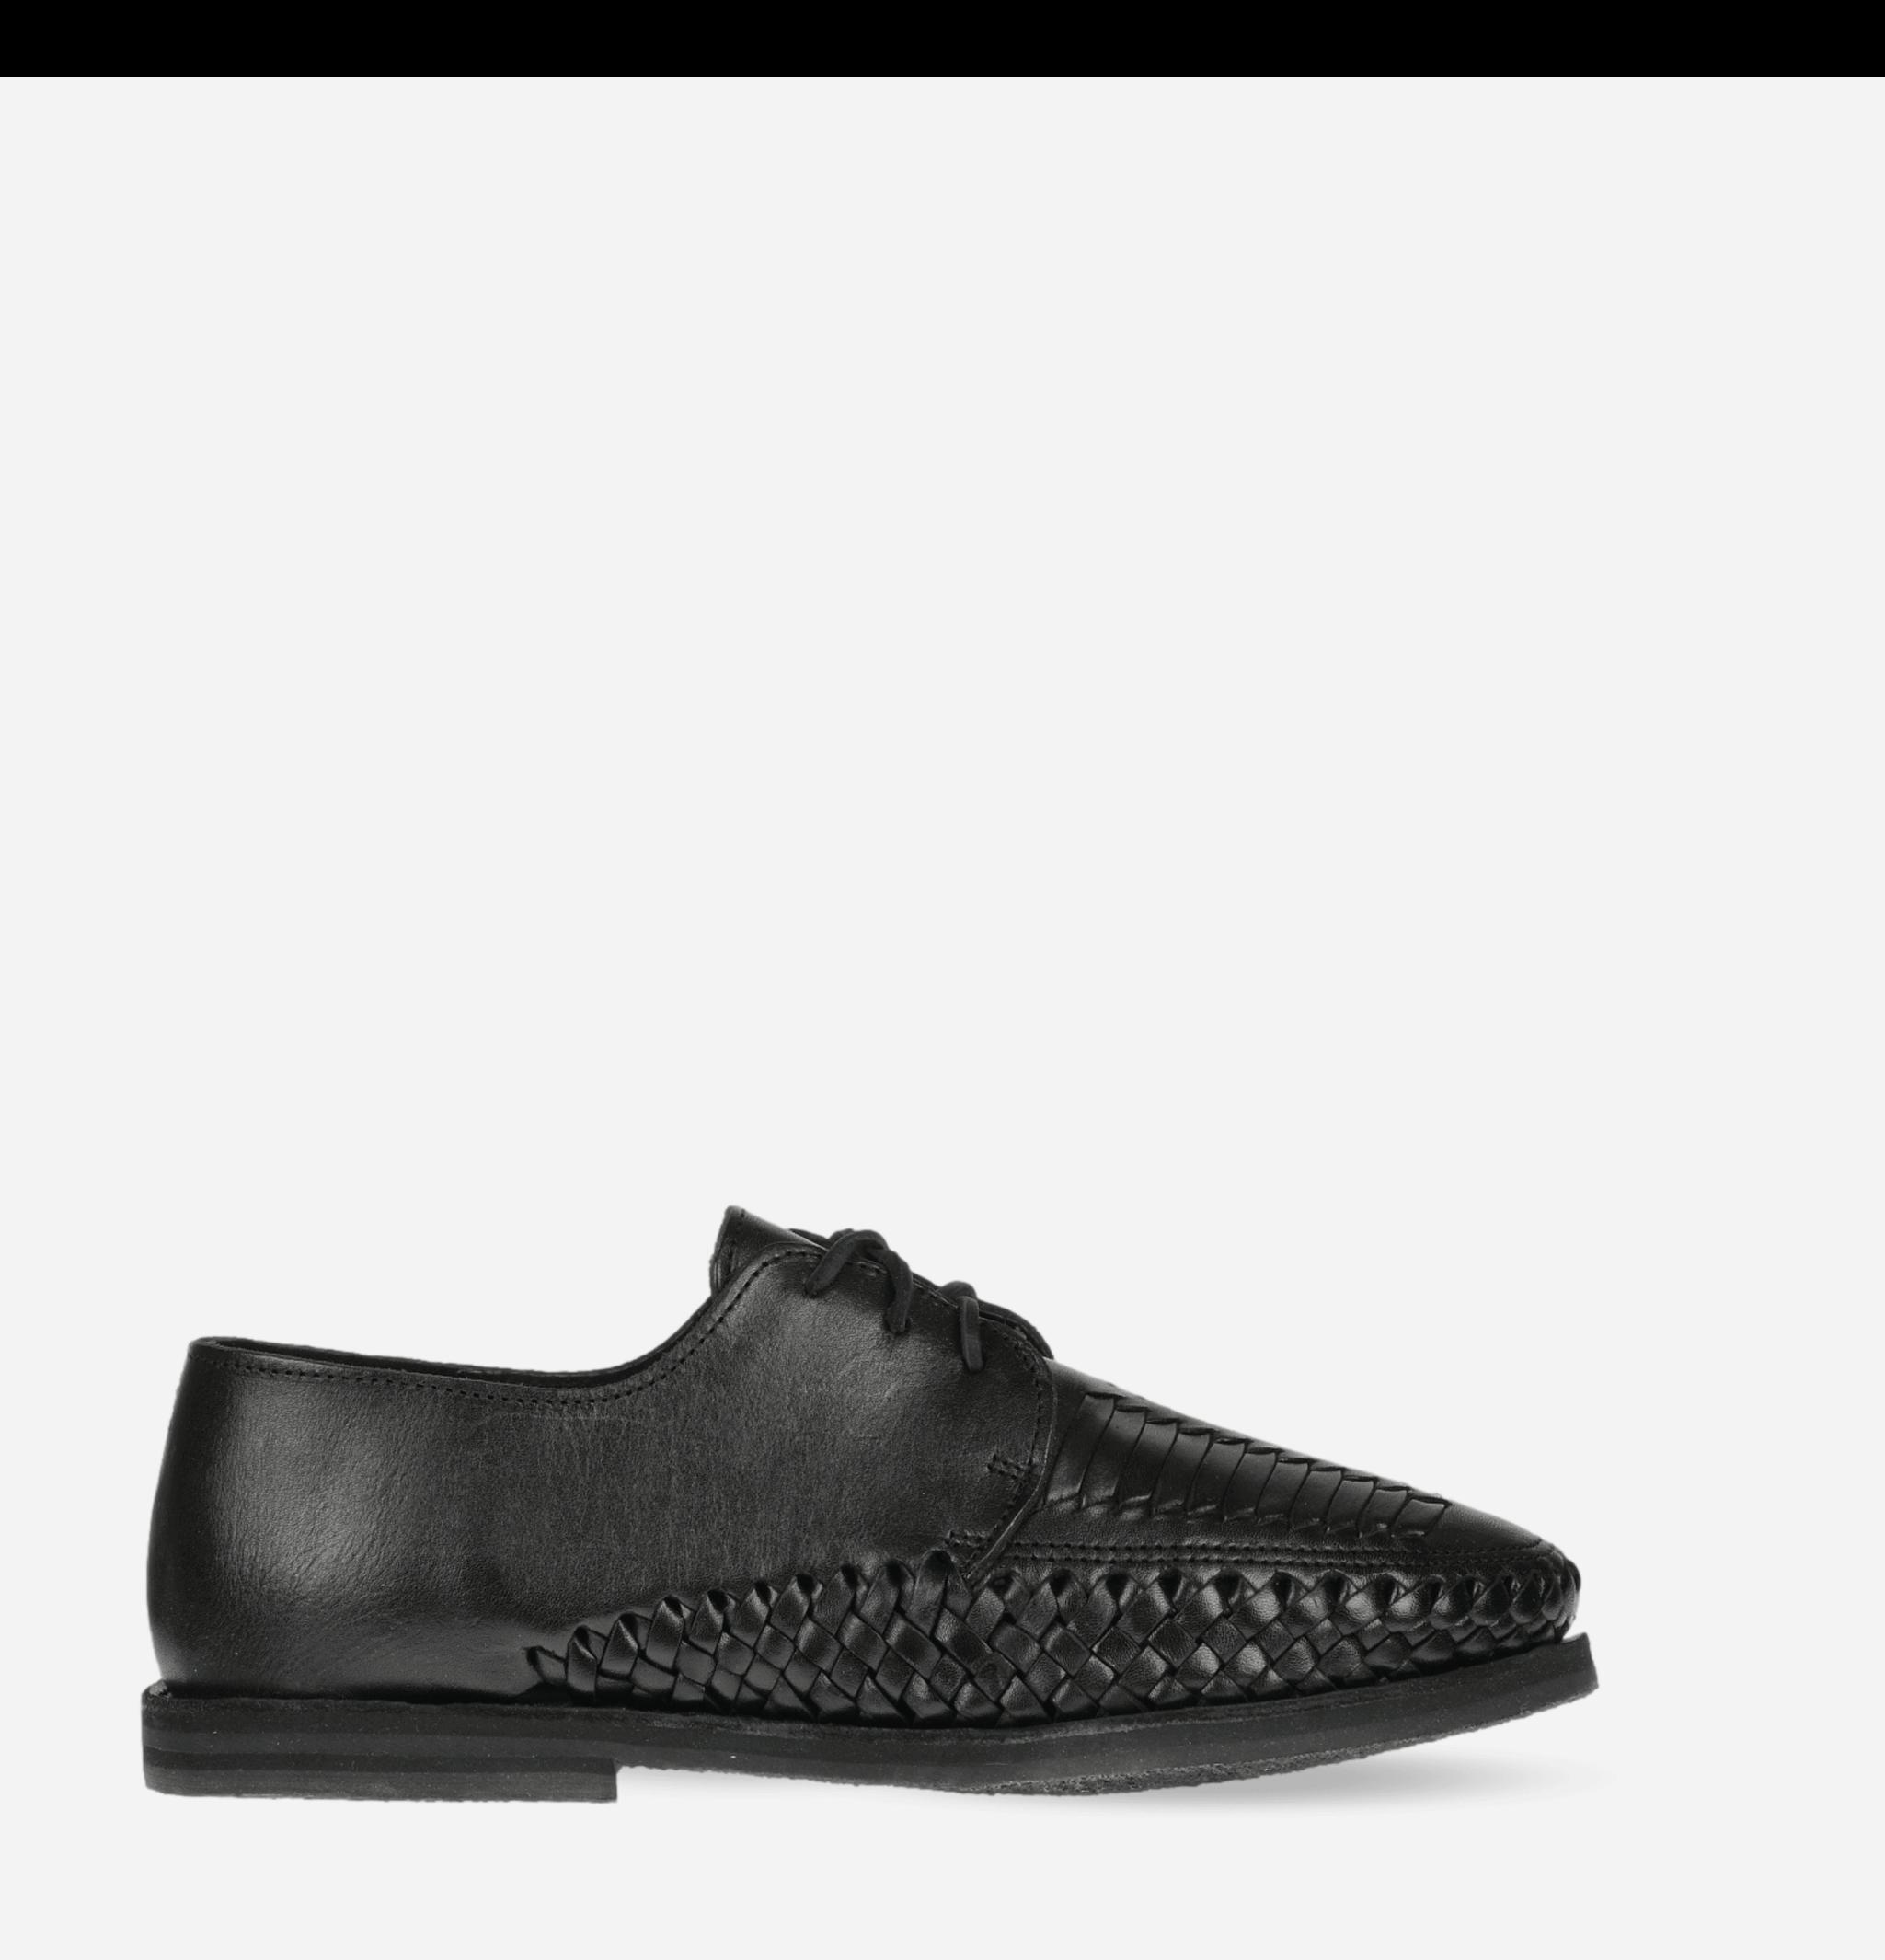 Veracruz Shoes Black